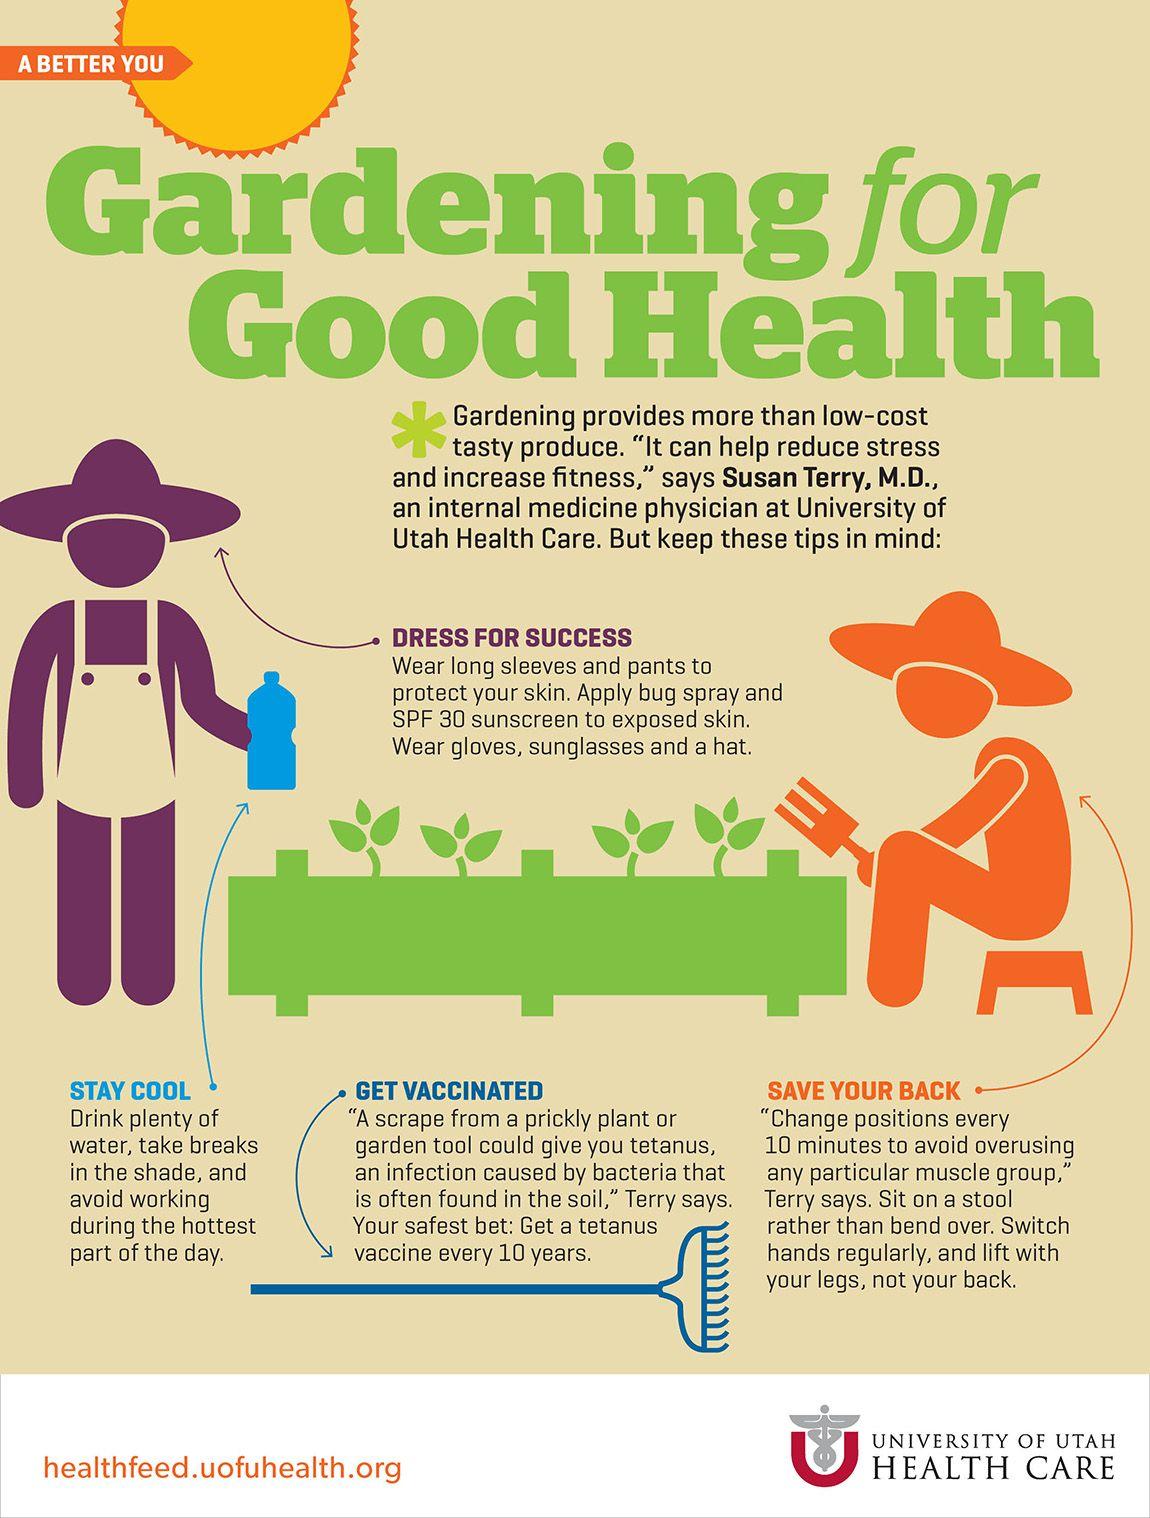 Gardening for Good Health Health Feed, University of